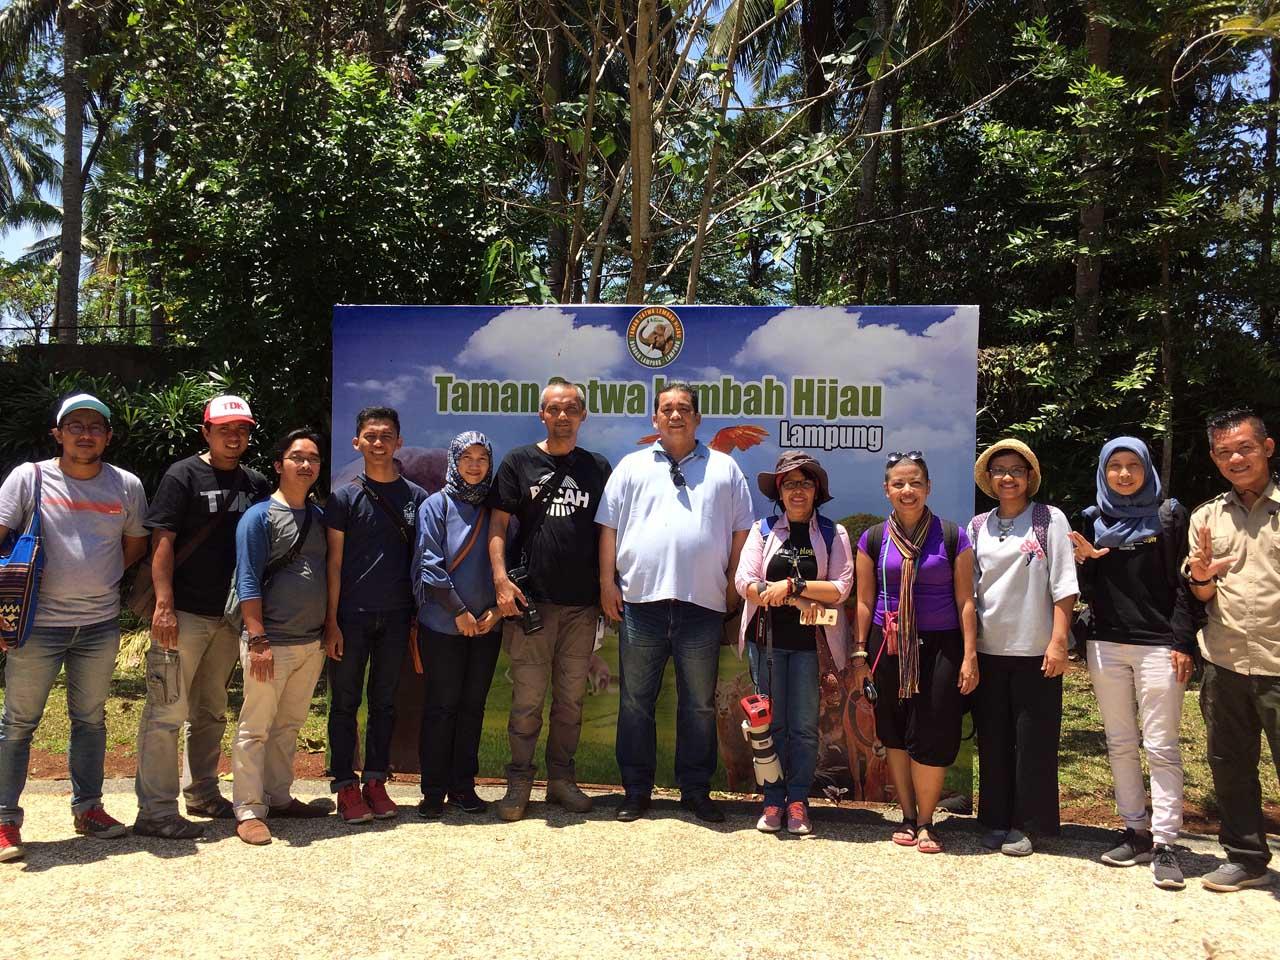 Libur Akhir Pekan Taman Satwa Lembah Hijau Lampung Cerita Jalan